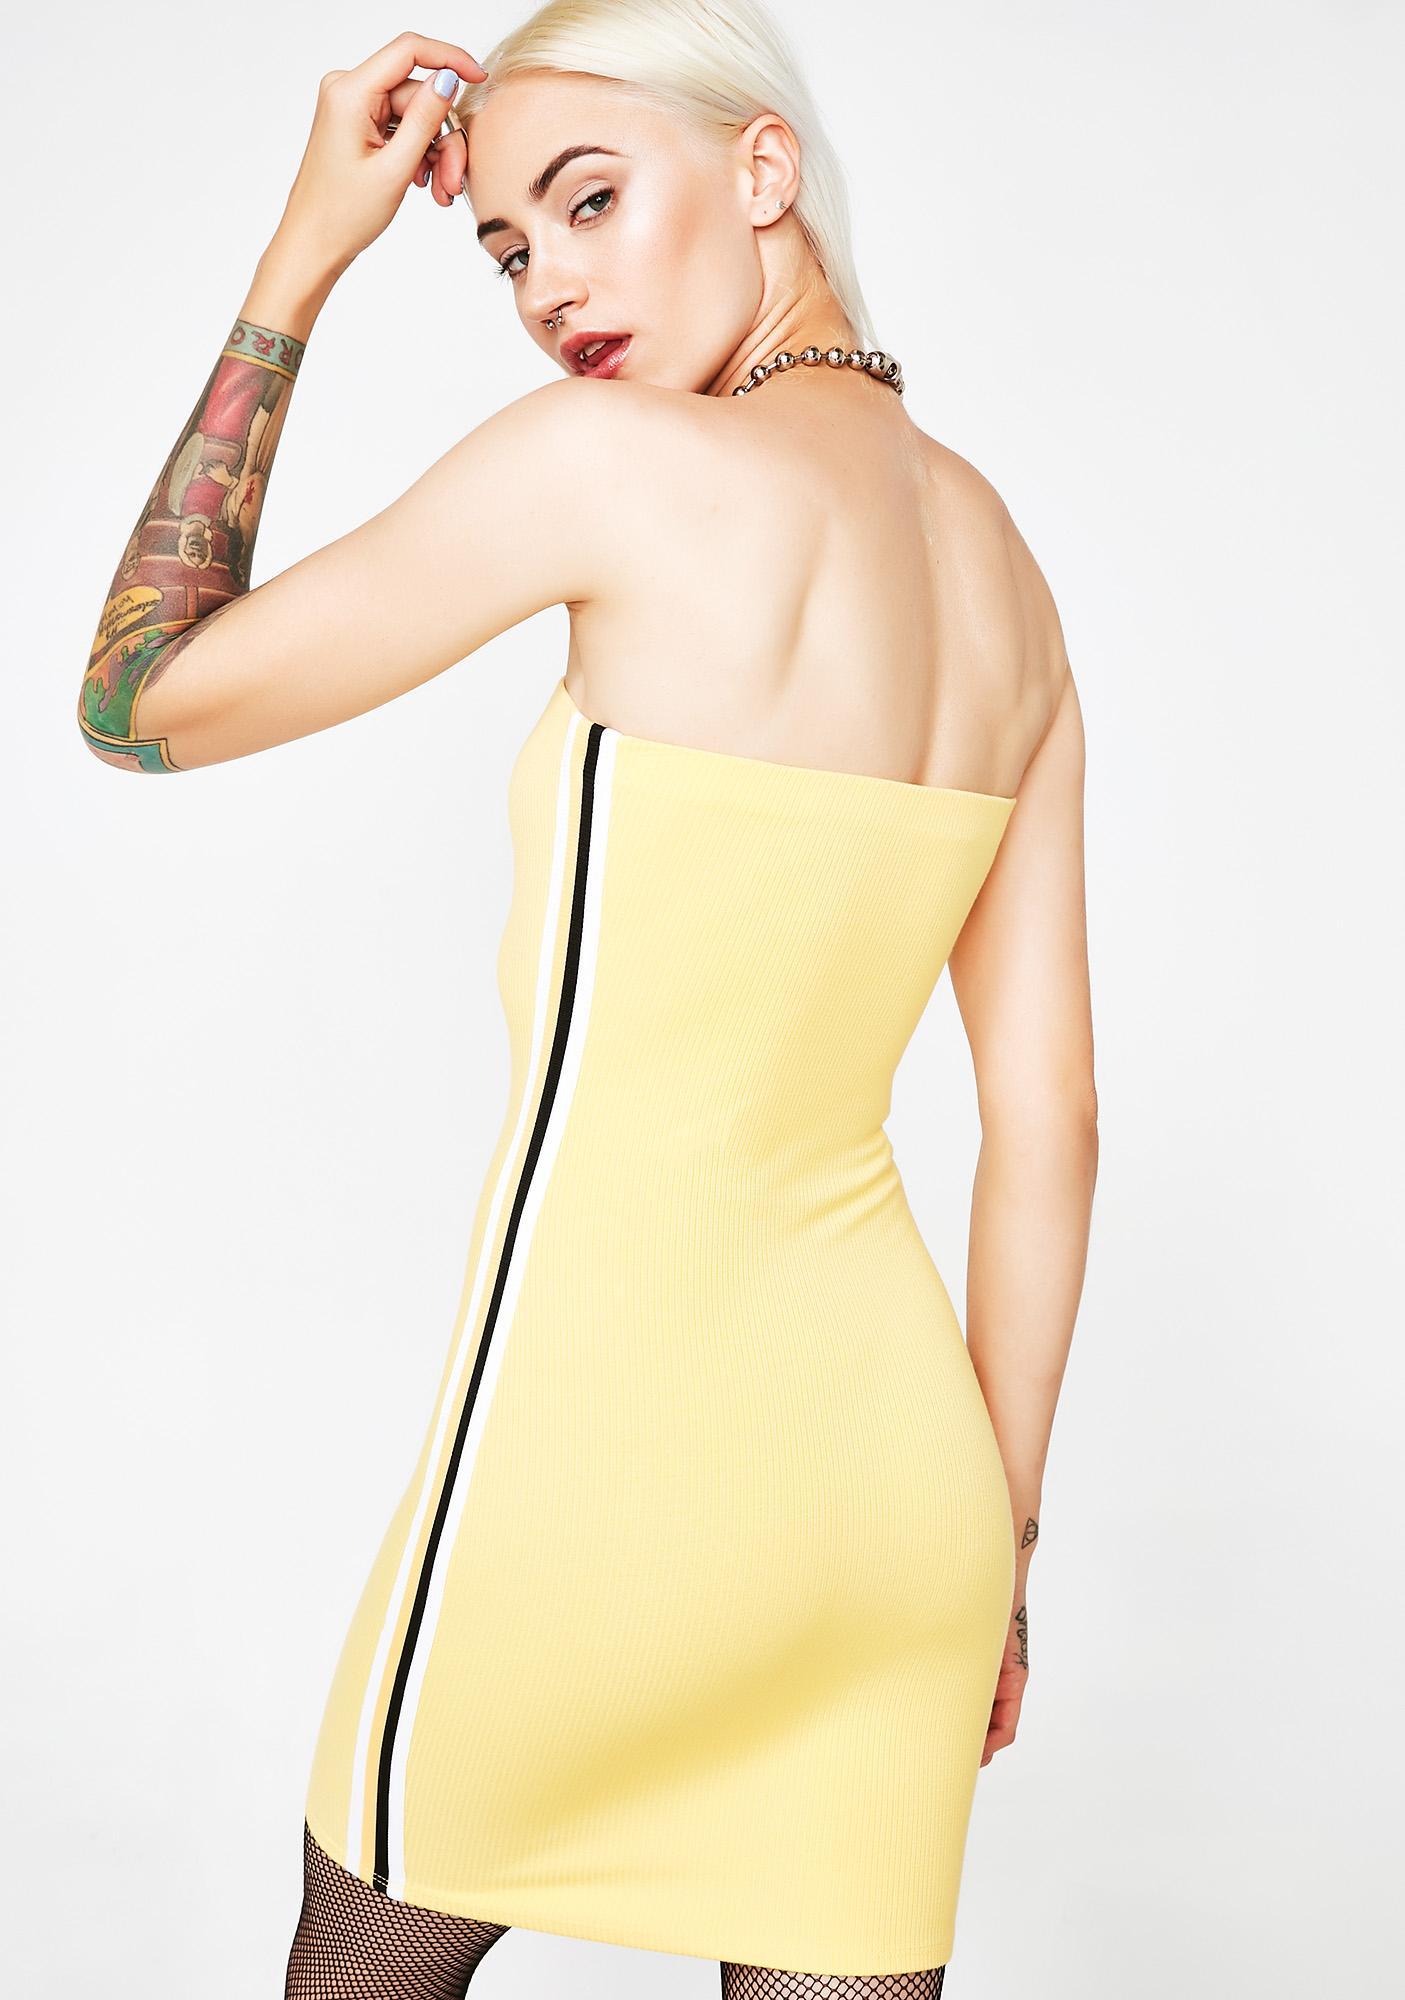 Dead Weight Tube Dress